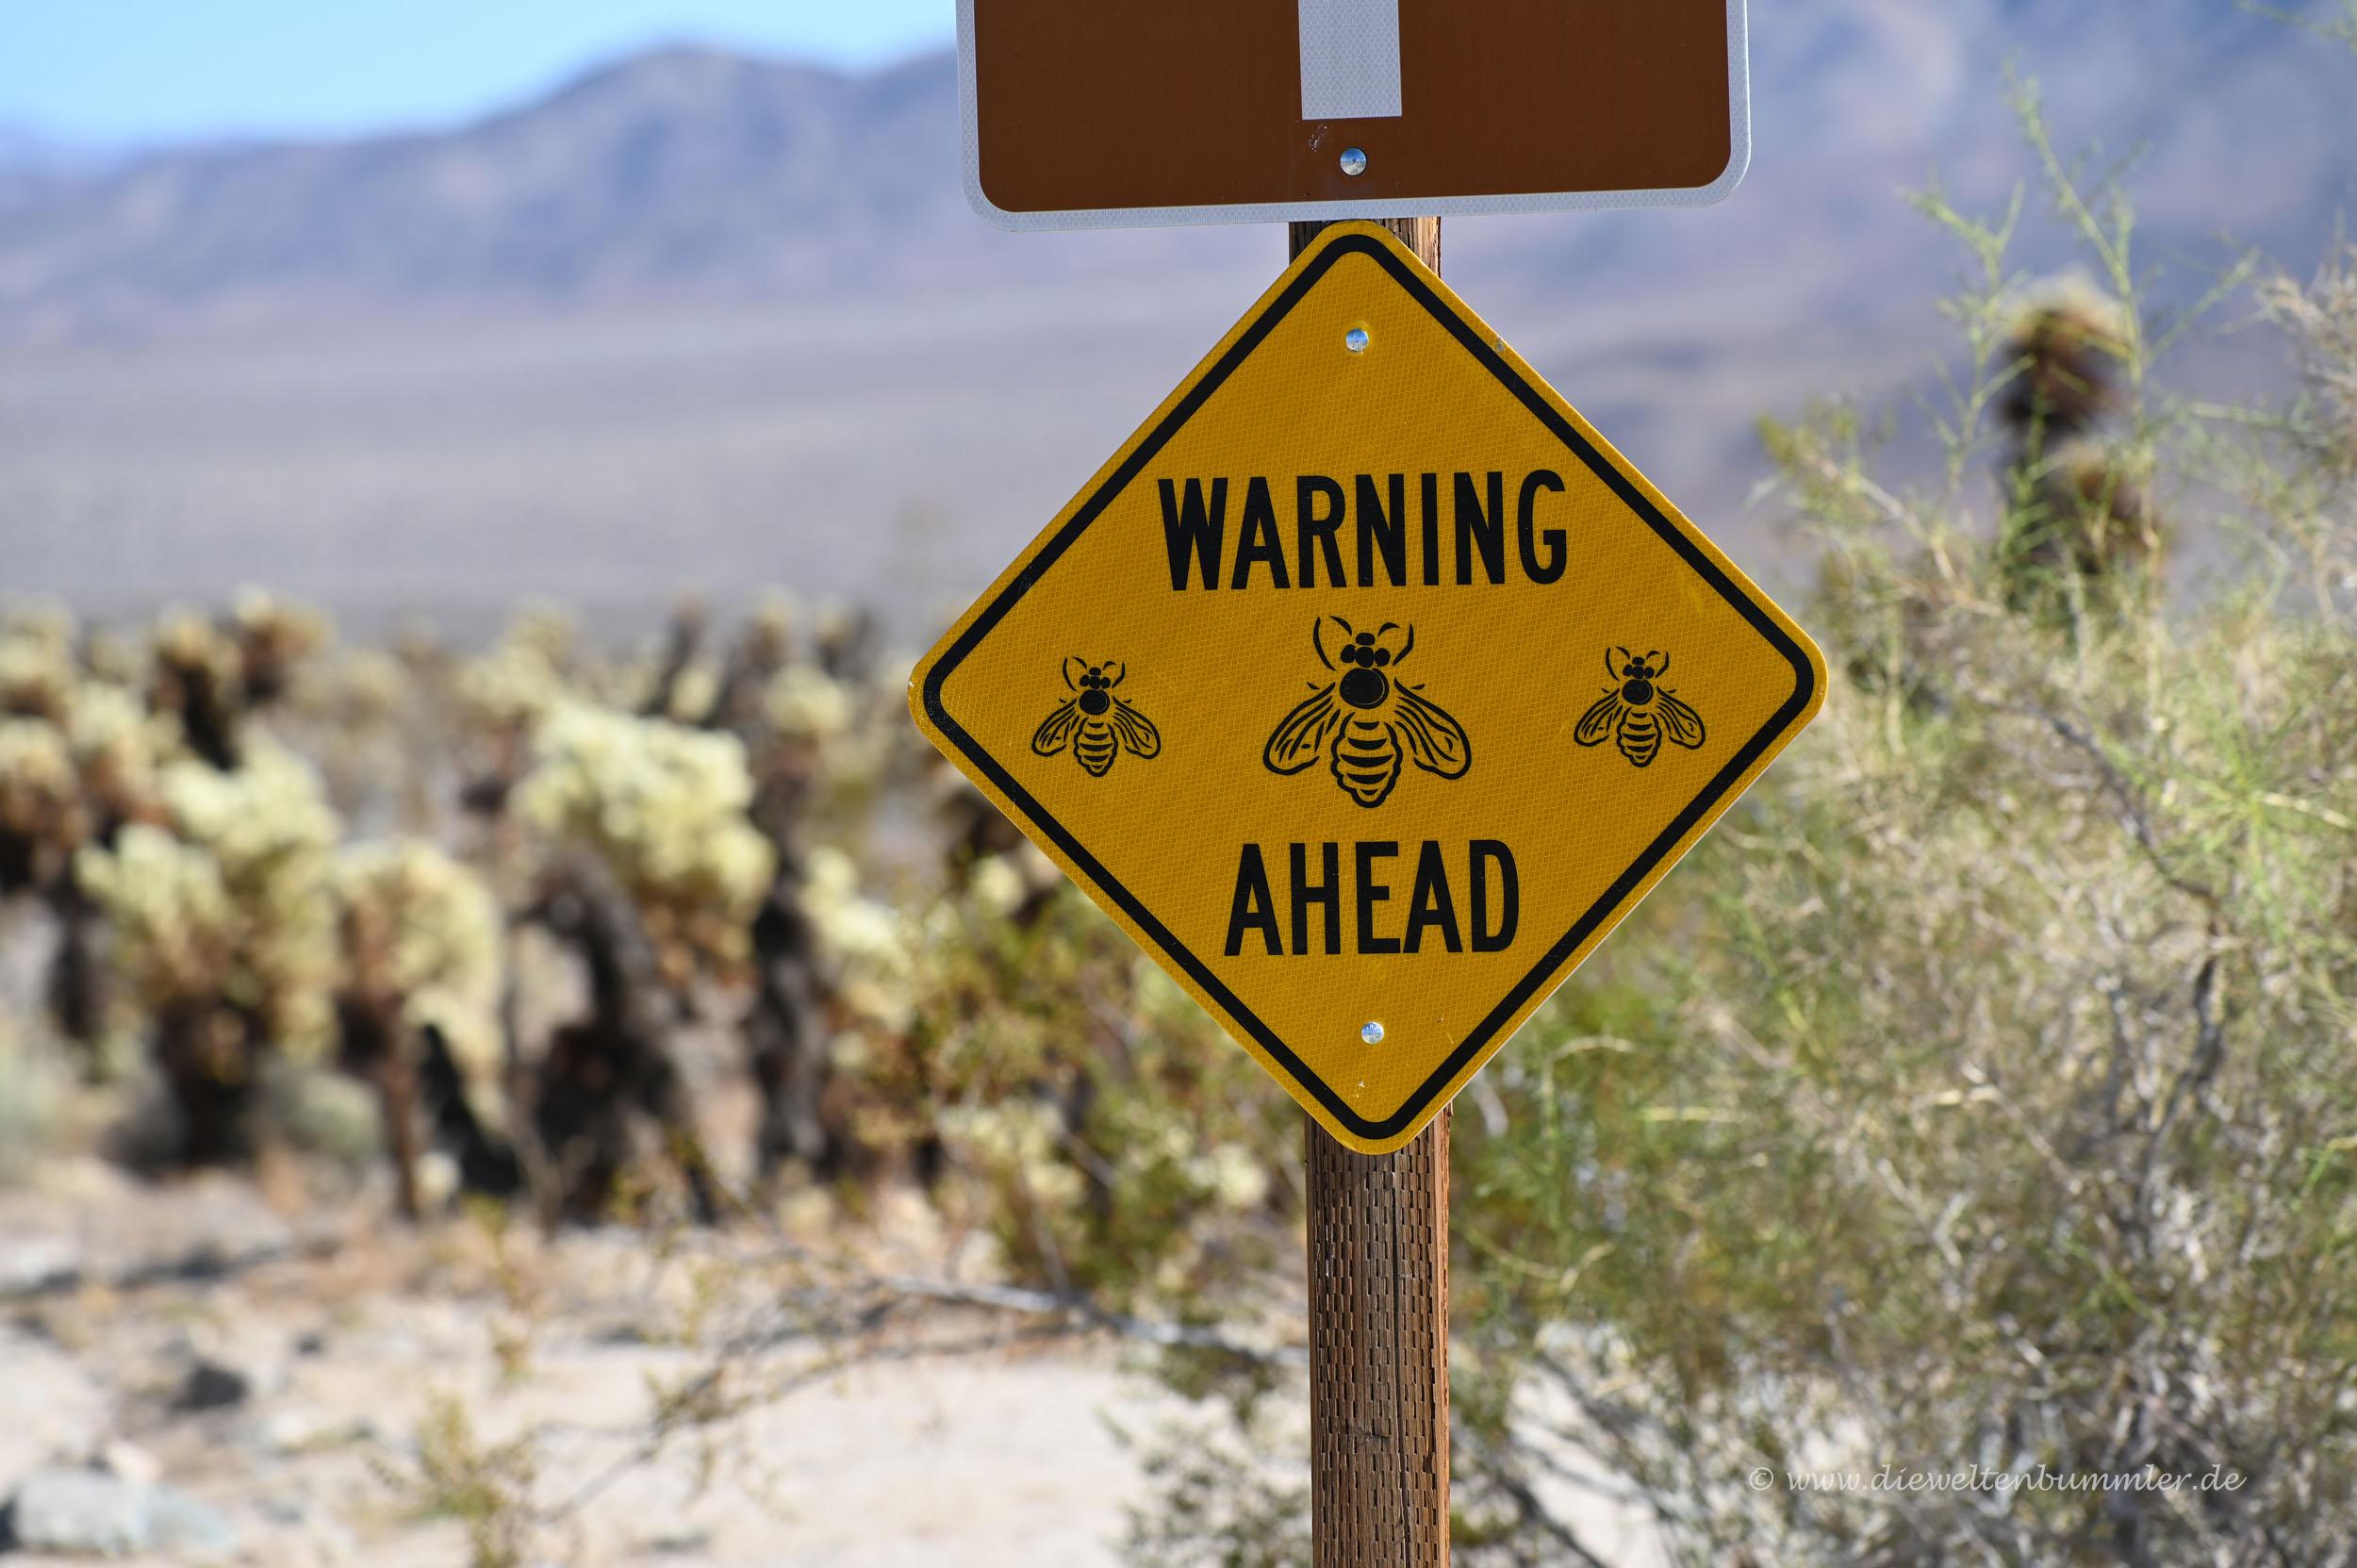 Achtung Bienen